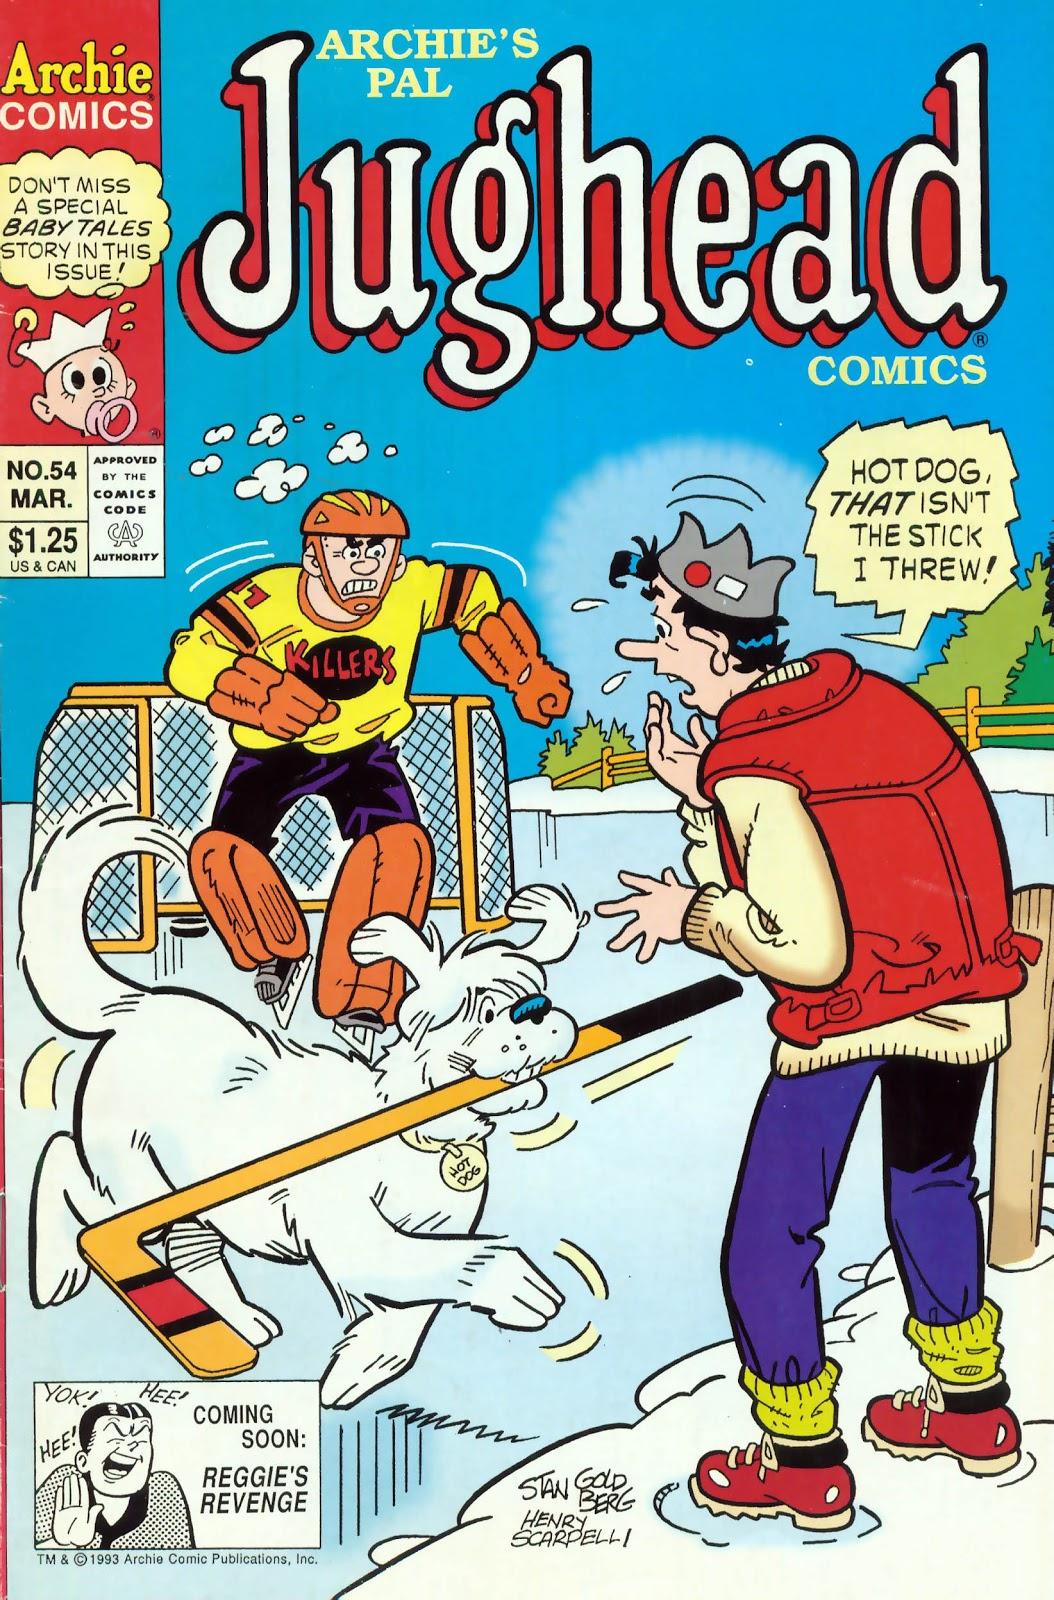 Read online Archie's Pal Jughead Comics comic -  Issue #54 - 1